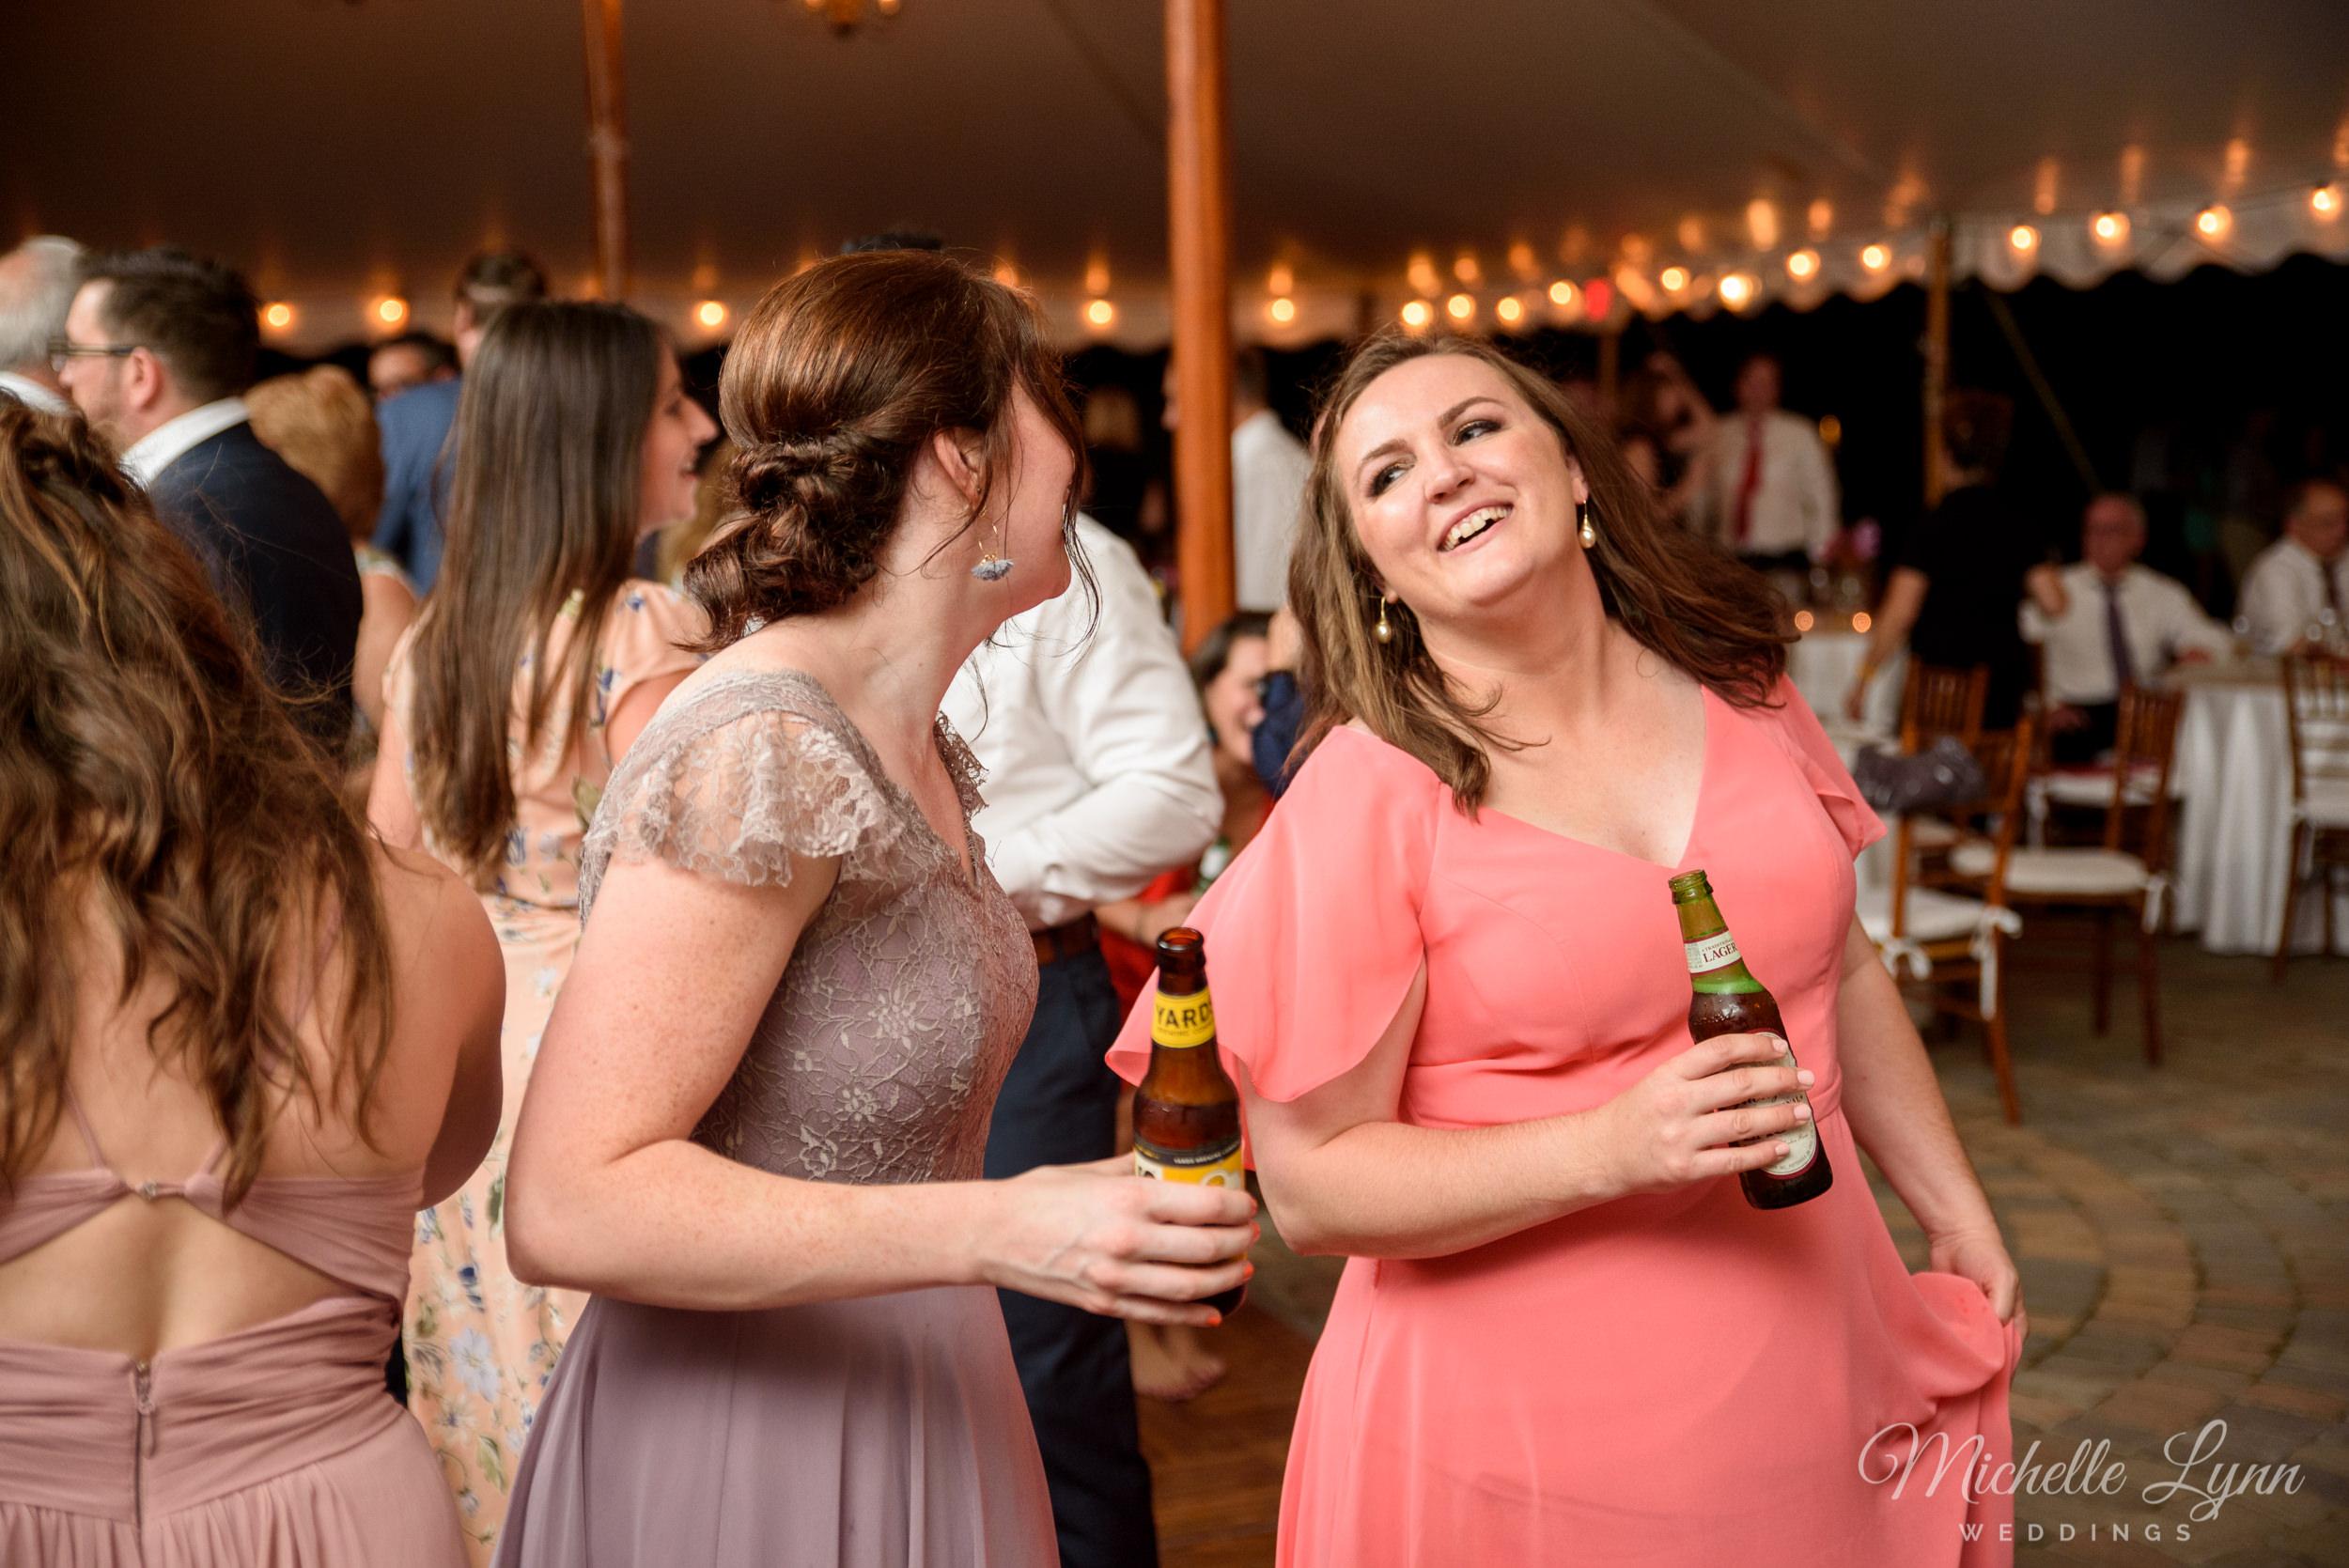 mlw-unionville-vineyards-nj-wedding-photography-99.jpg